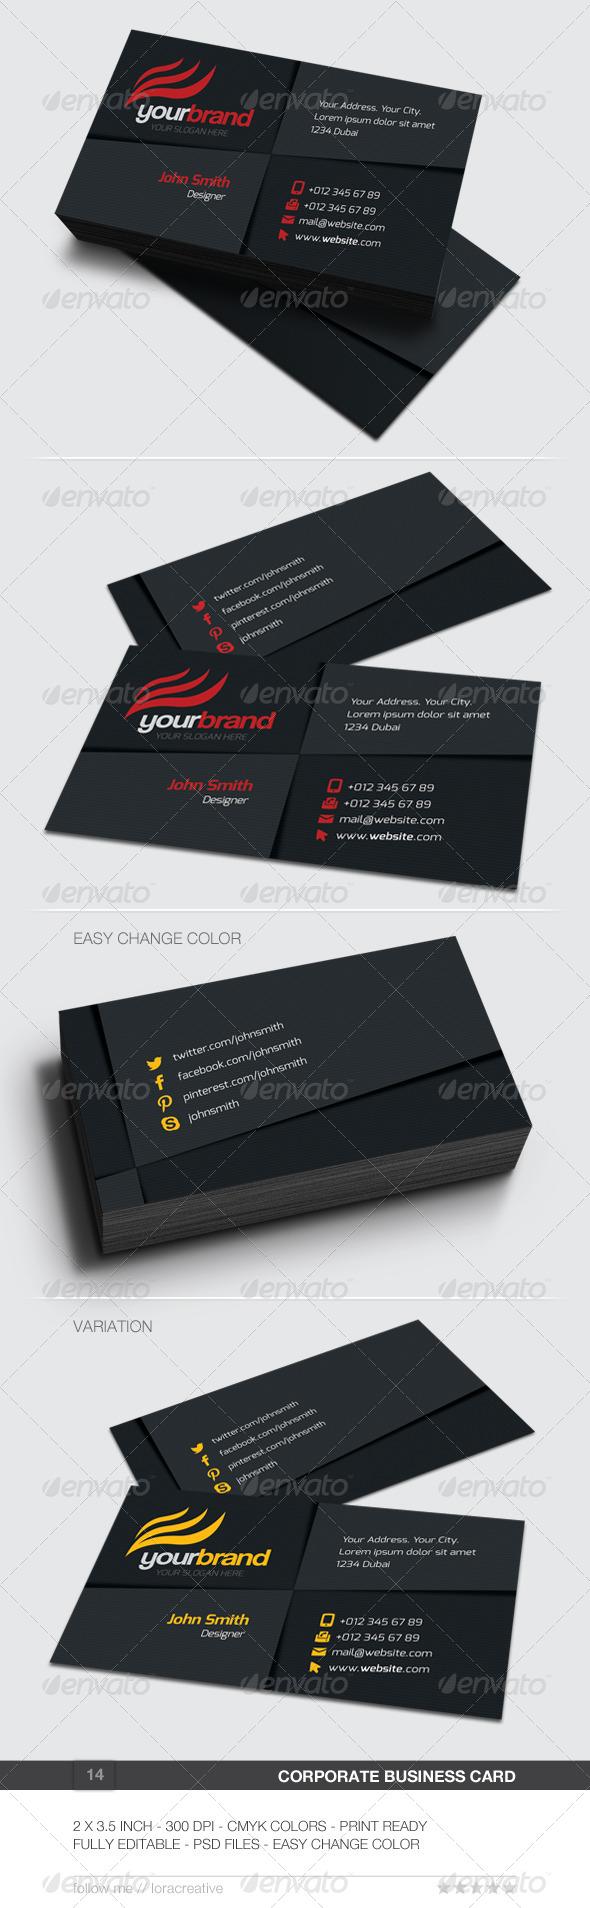 Corporate Business Card - 14 - Corporate Business Cards